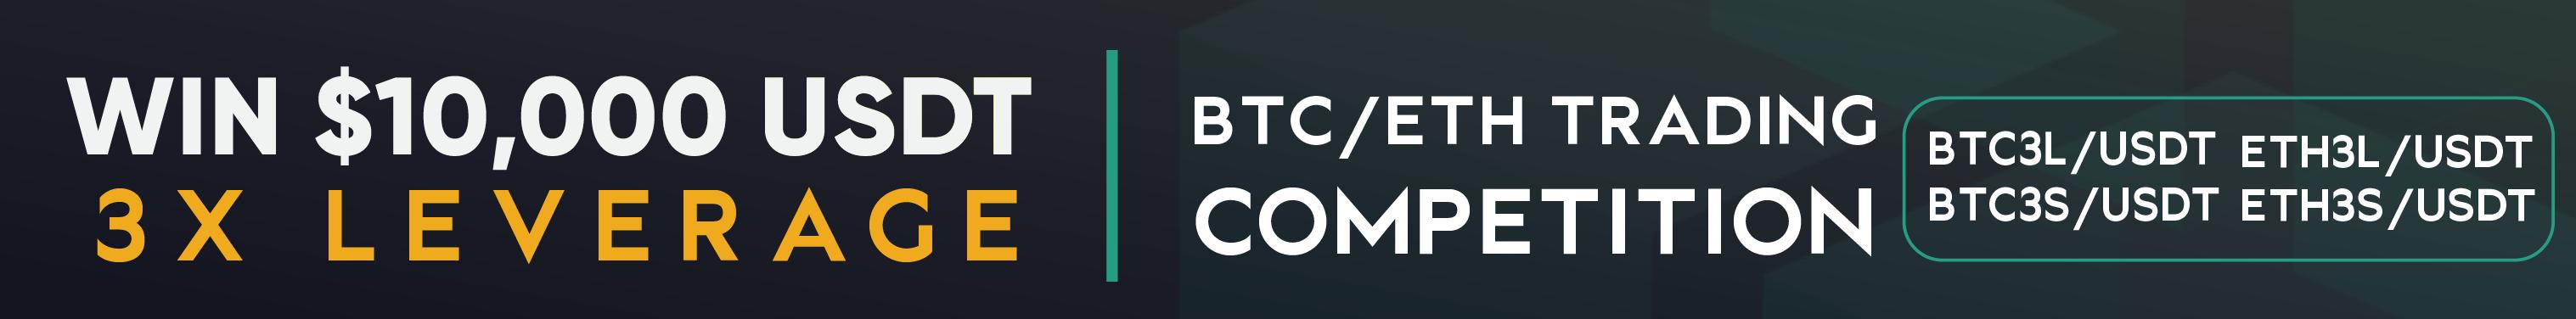 AMUN leverage BTC/ETH trading competition